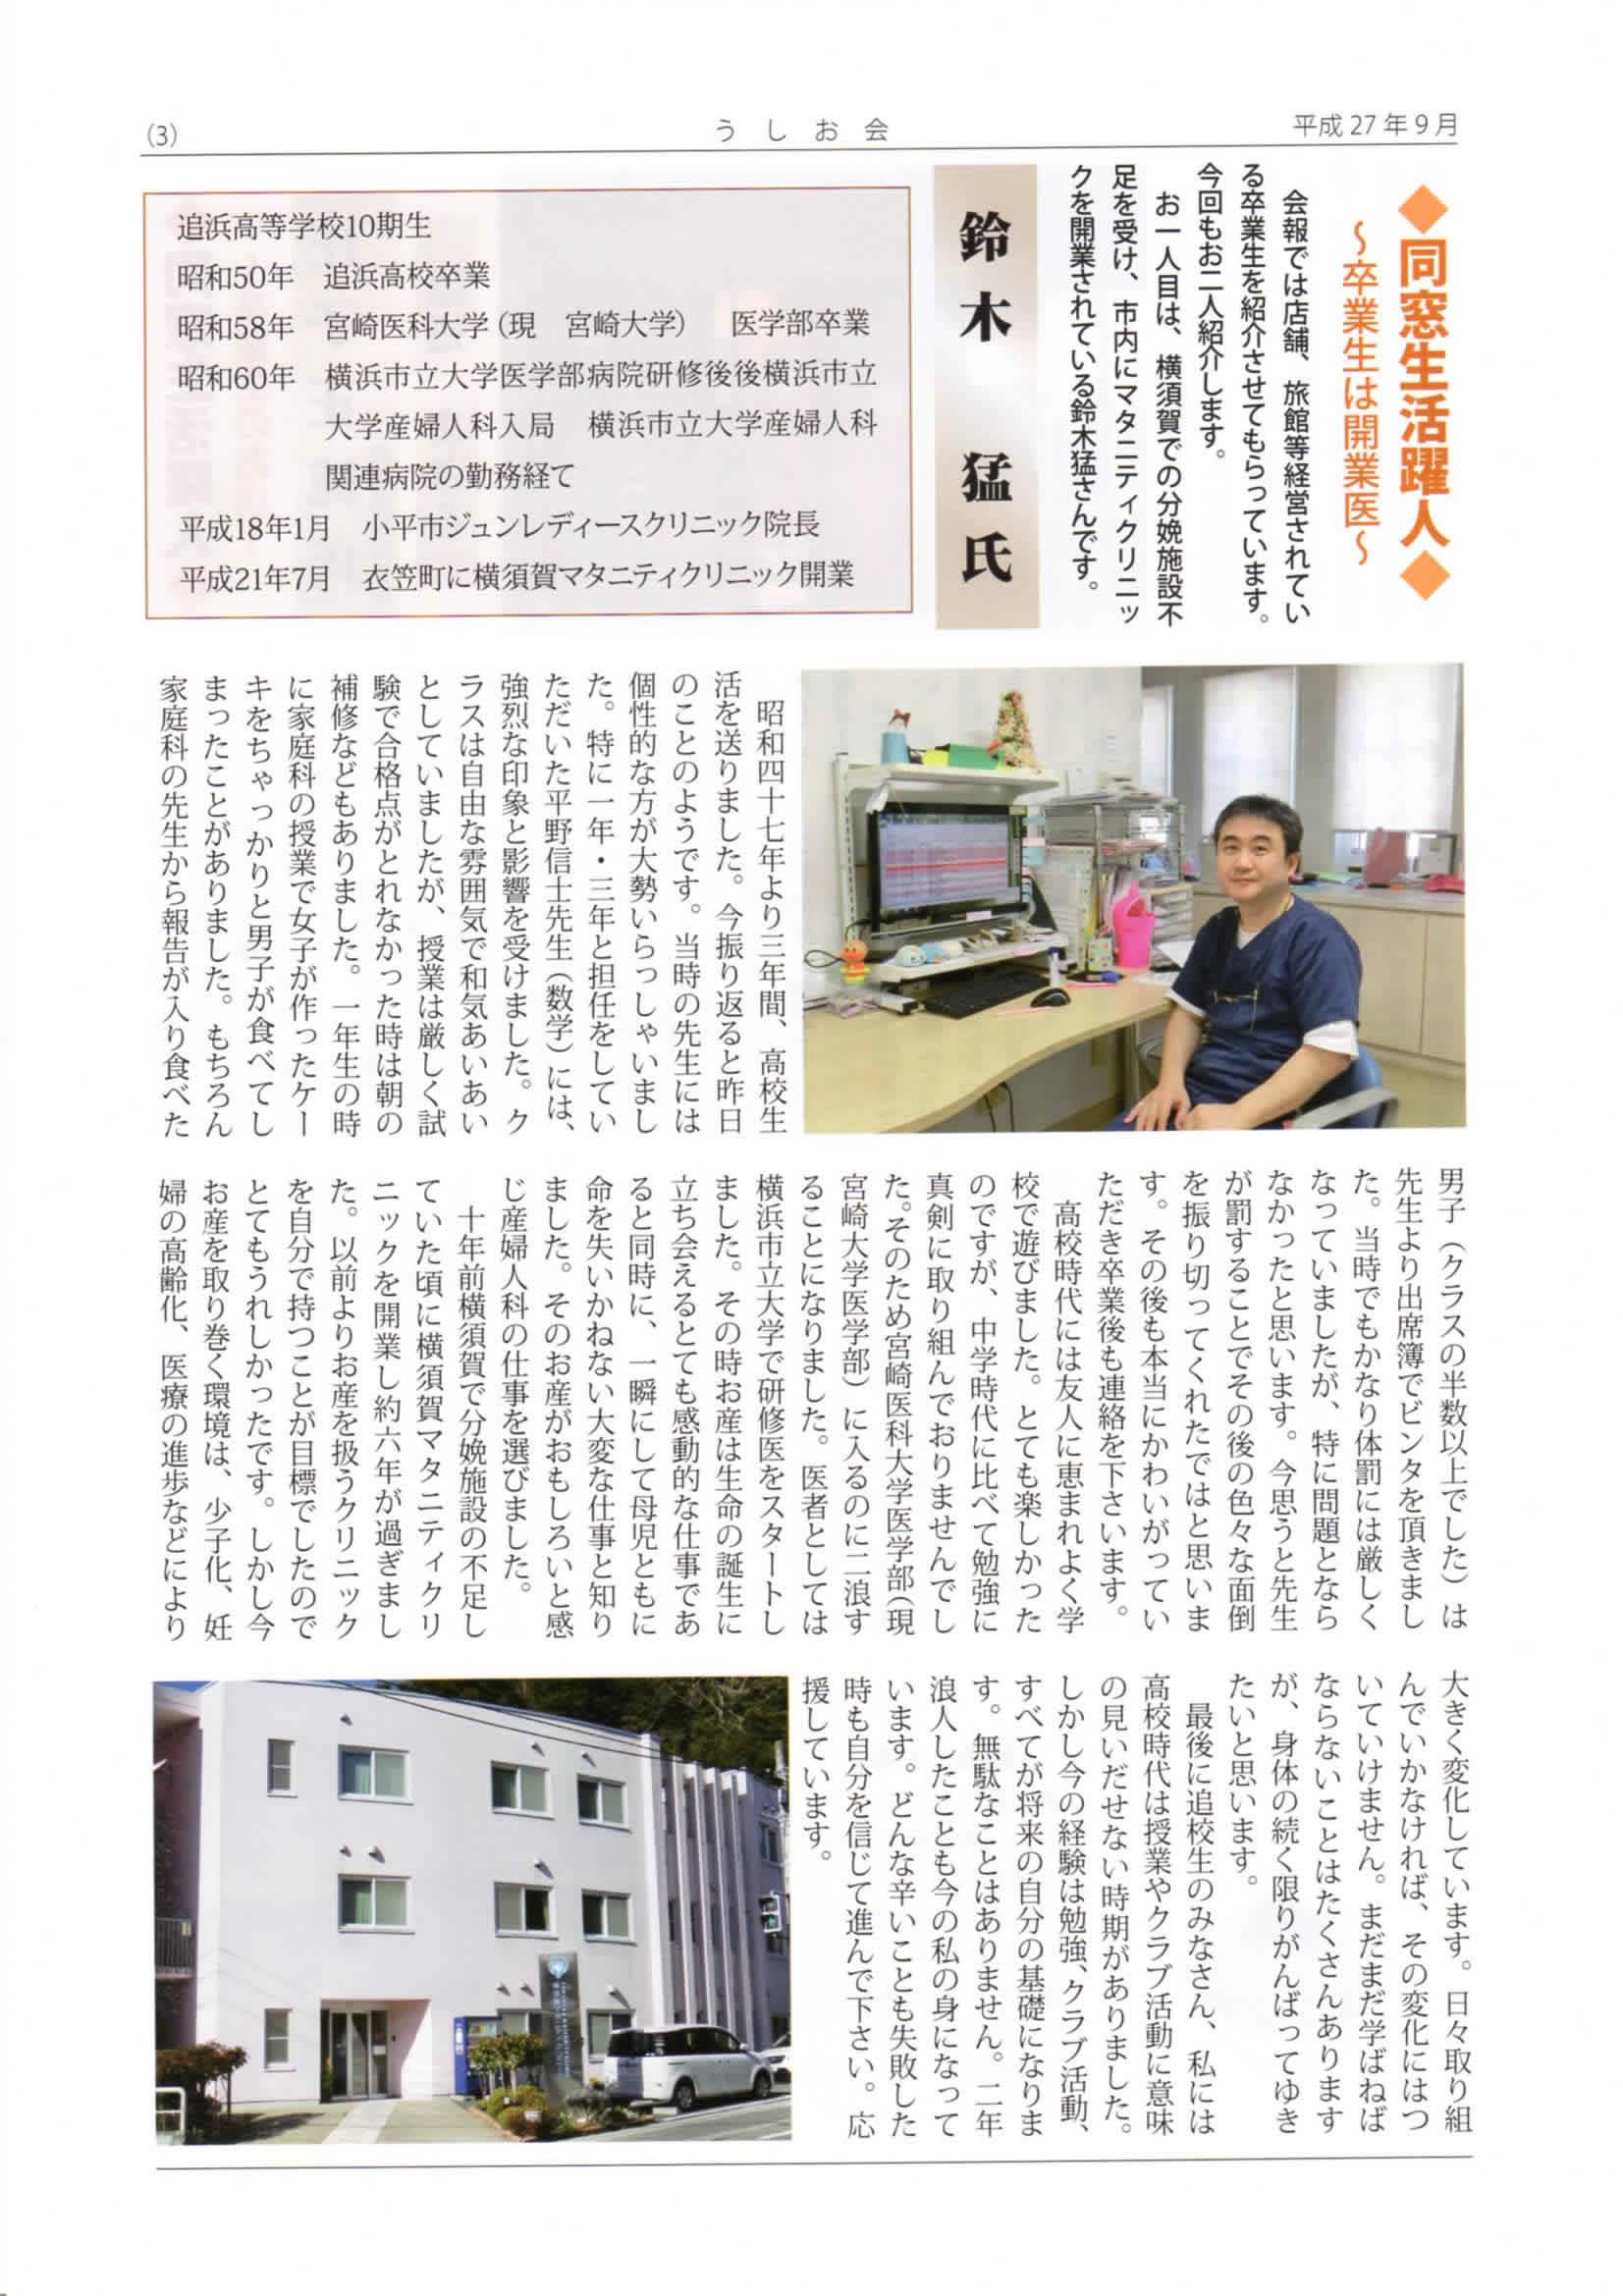 http://www.xn--p8ji2b326tgf0astg8i7difs.jp/ushio-info/images/ushio_201509_3.jpg